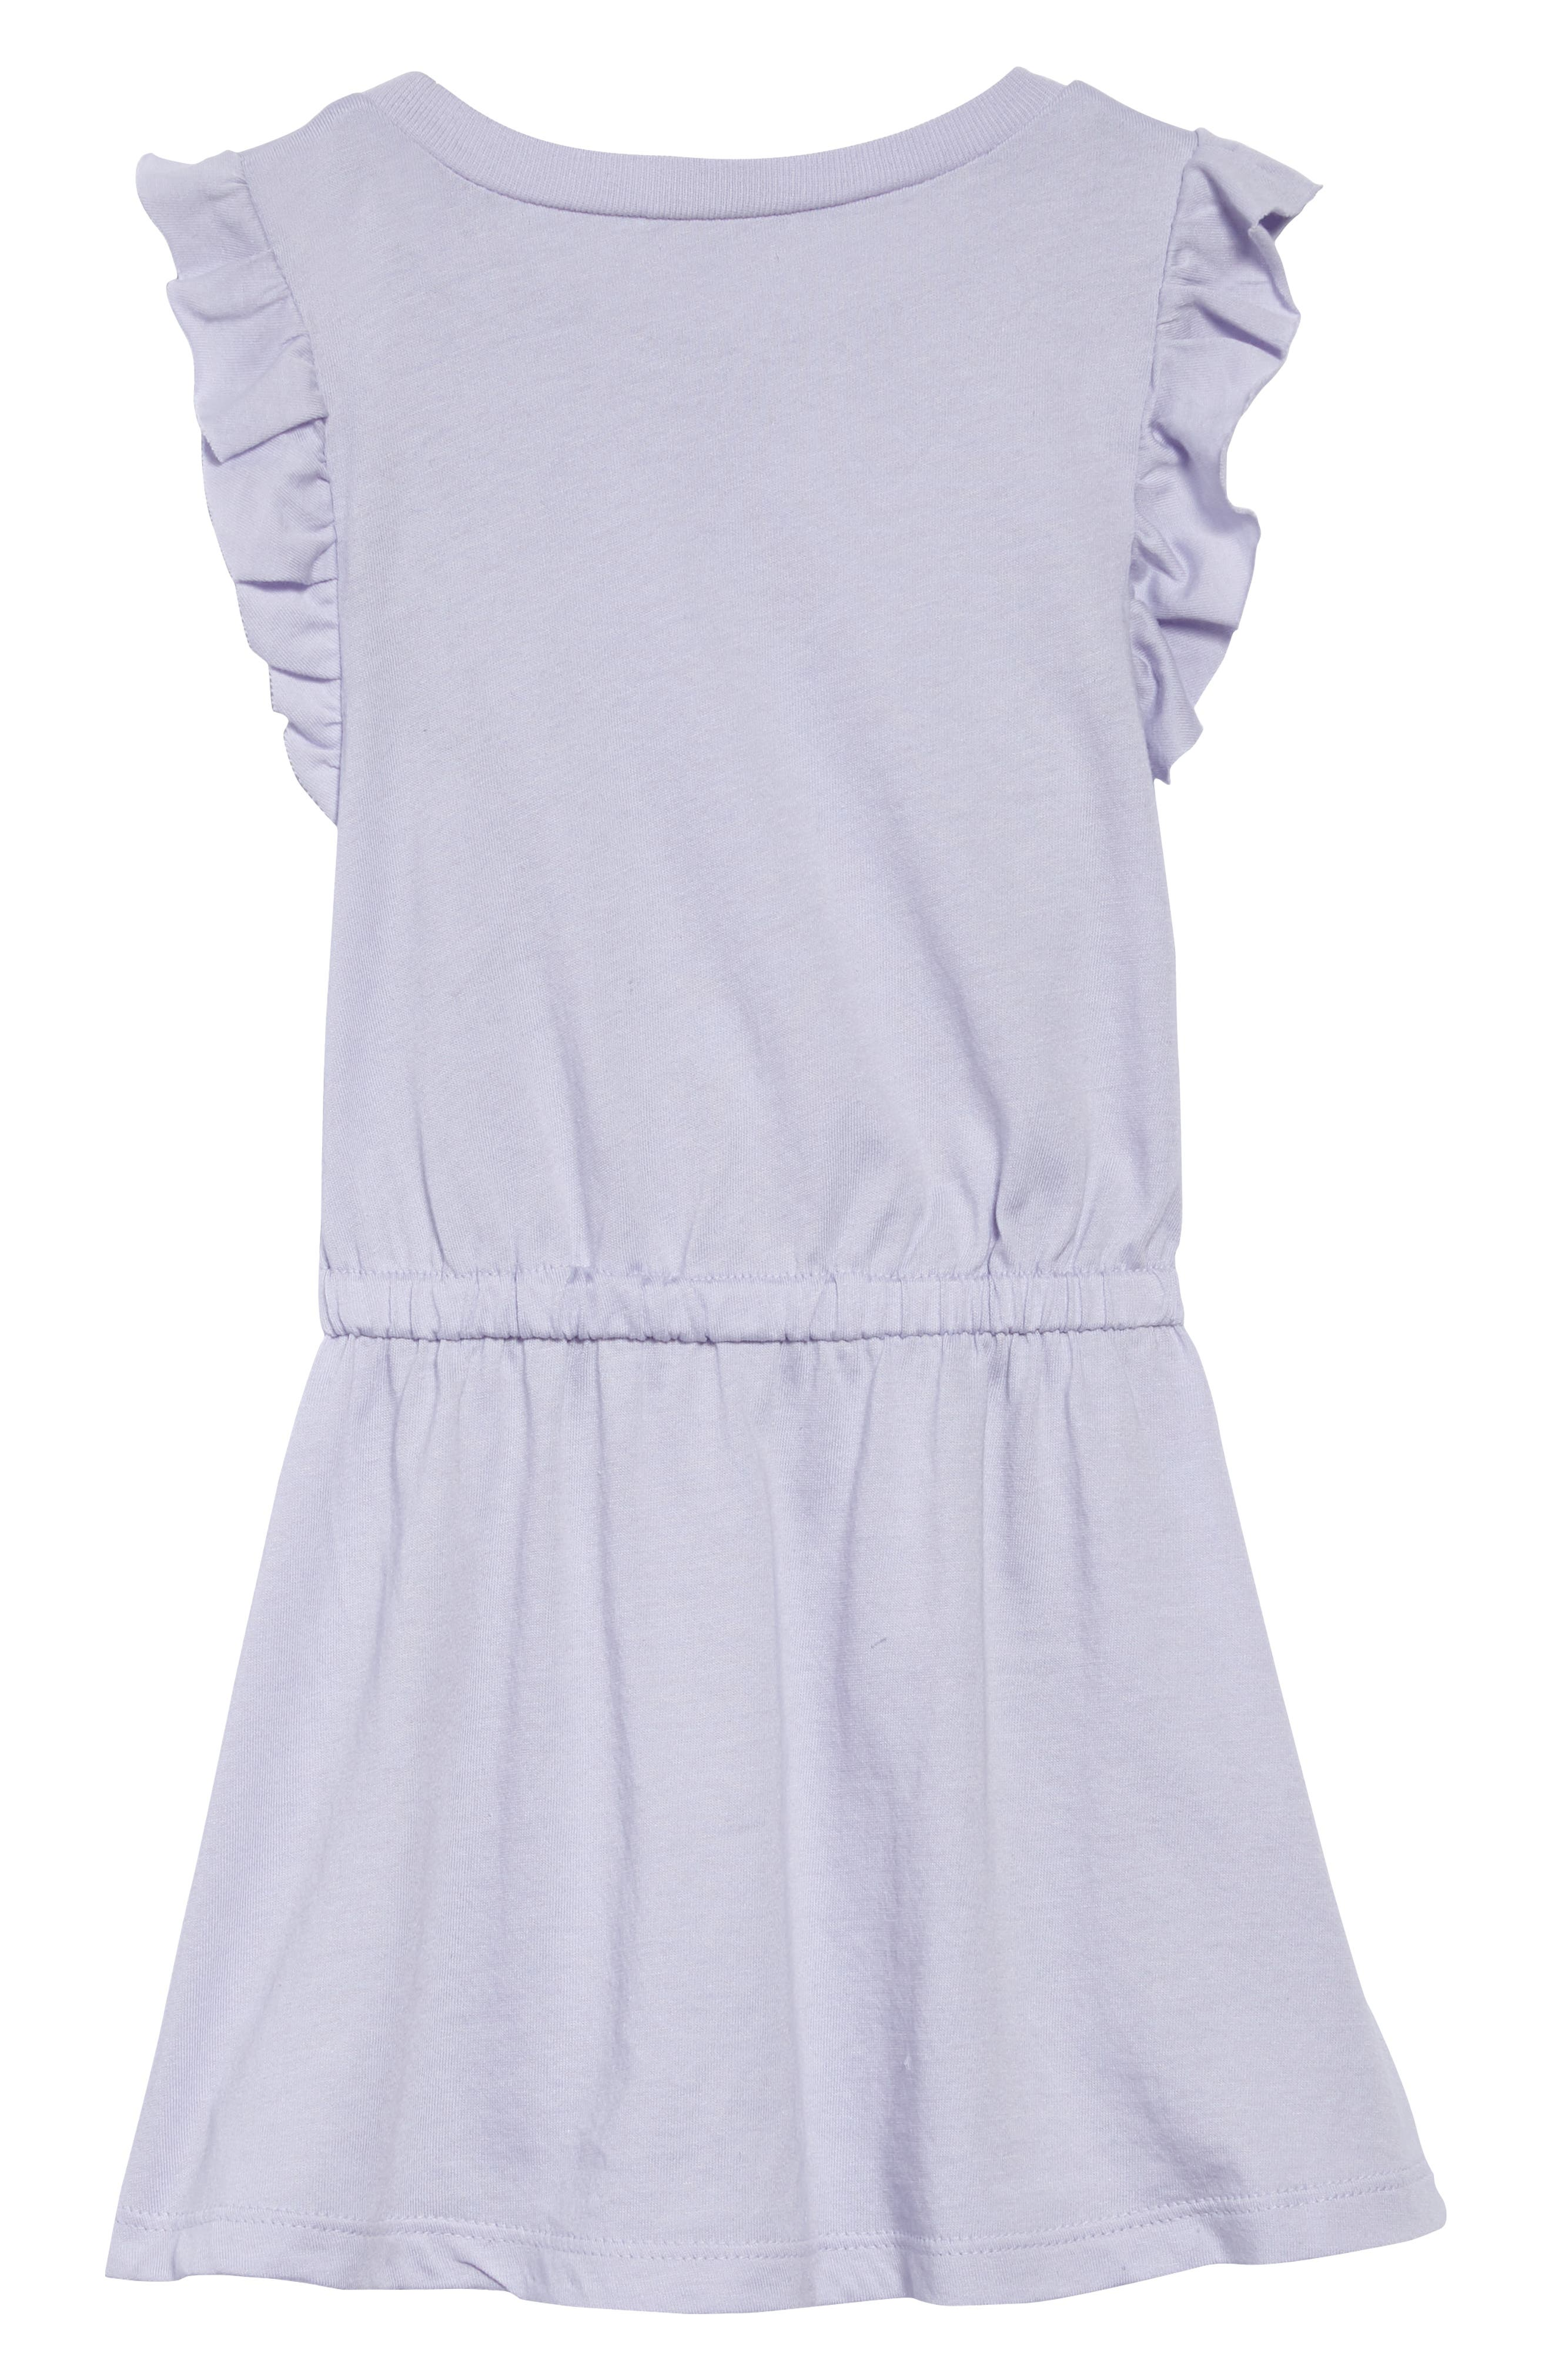 Ruffle Dress,                             Alternate thumbnail 2, color,                             530